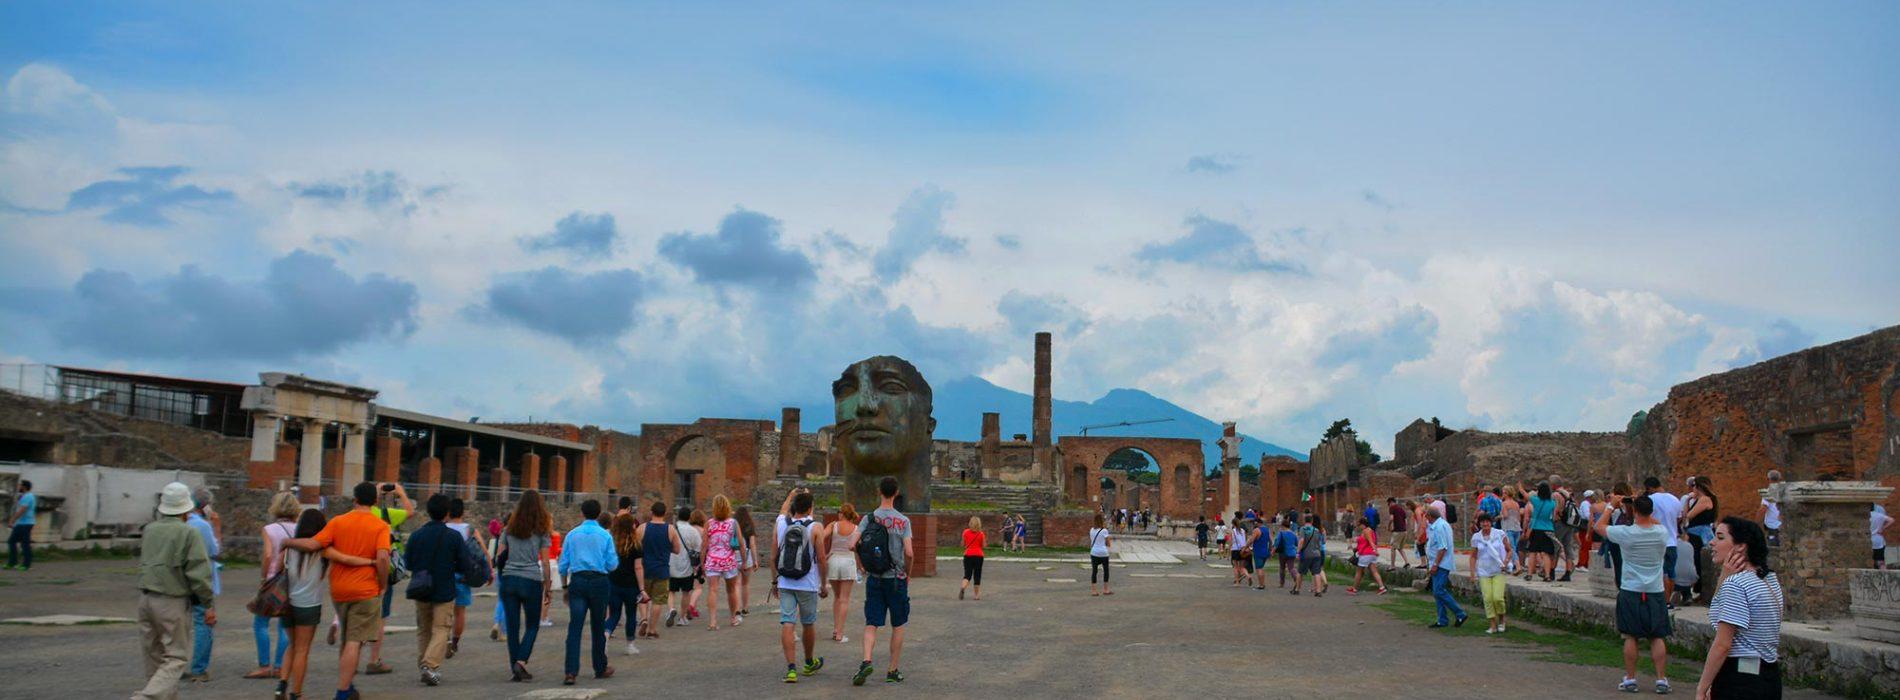 Pompeii from Amalfi Coast